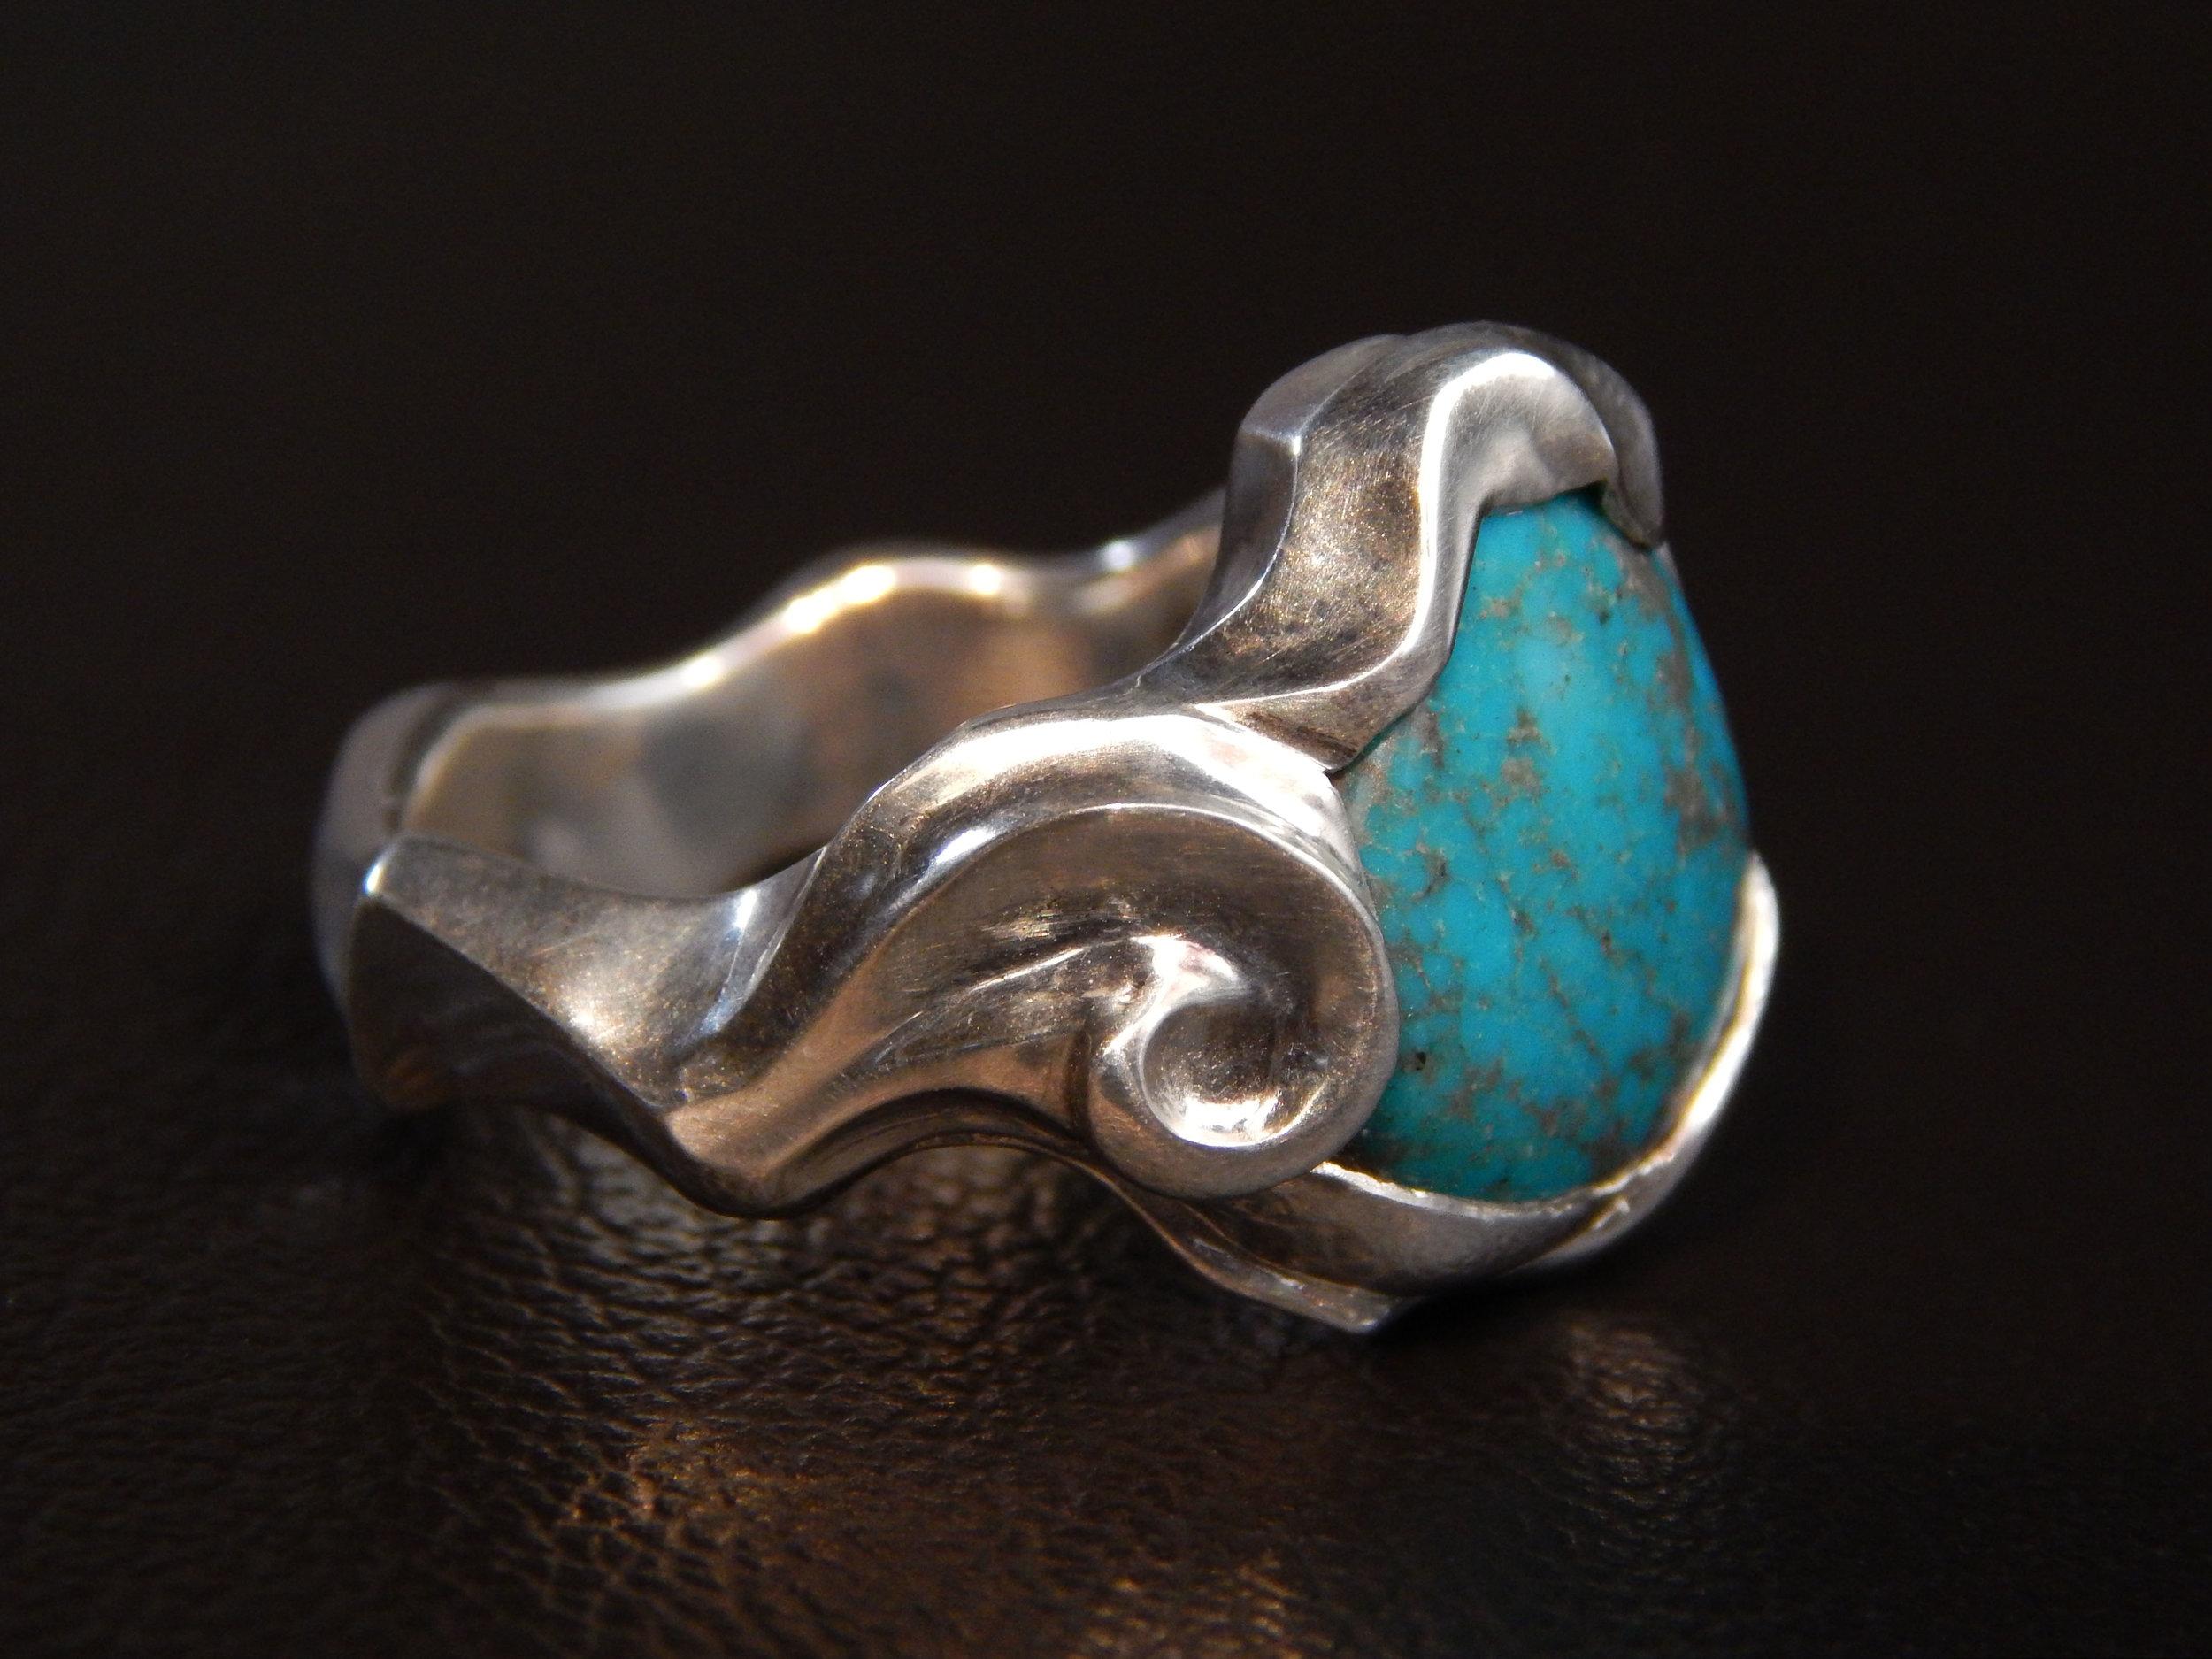 darvier-antiqued-sterling-turquoise-ocean-wave-ring.JPG